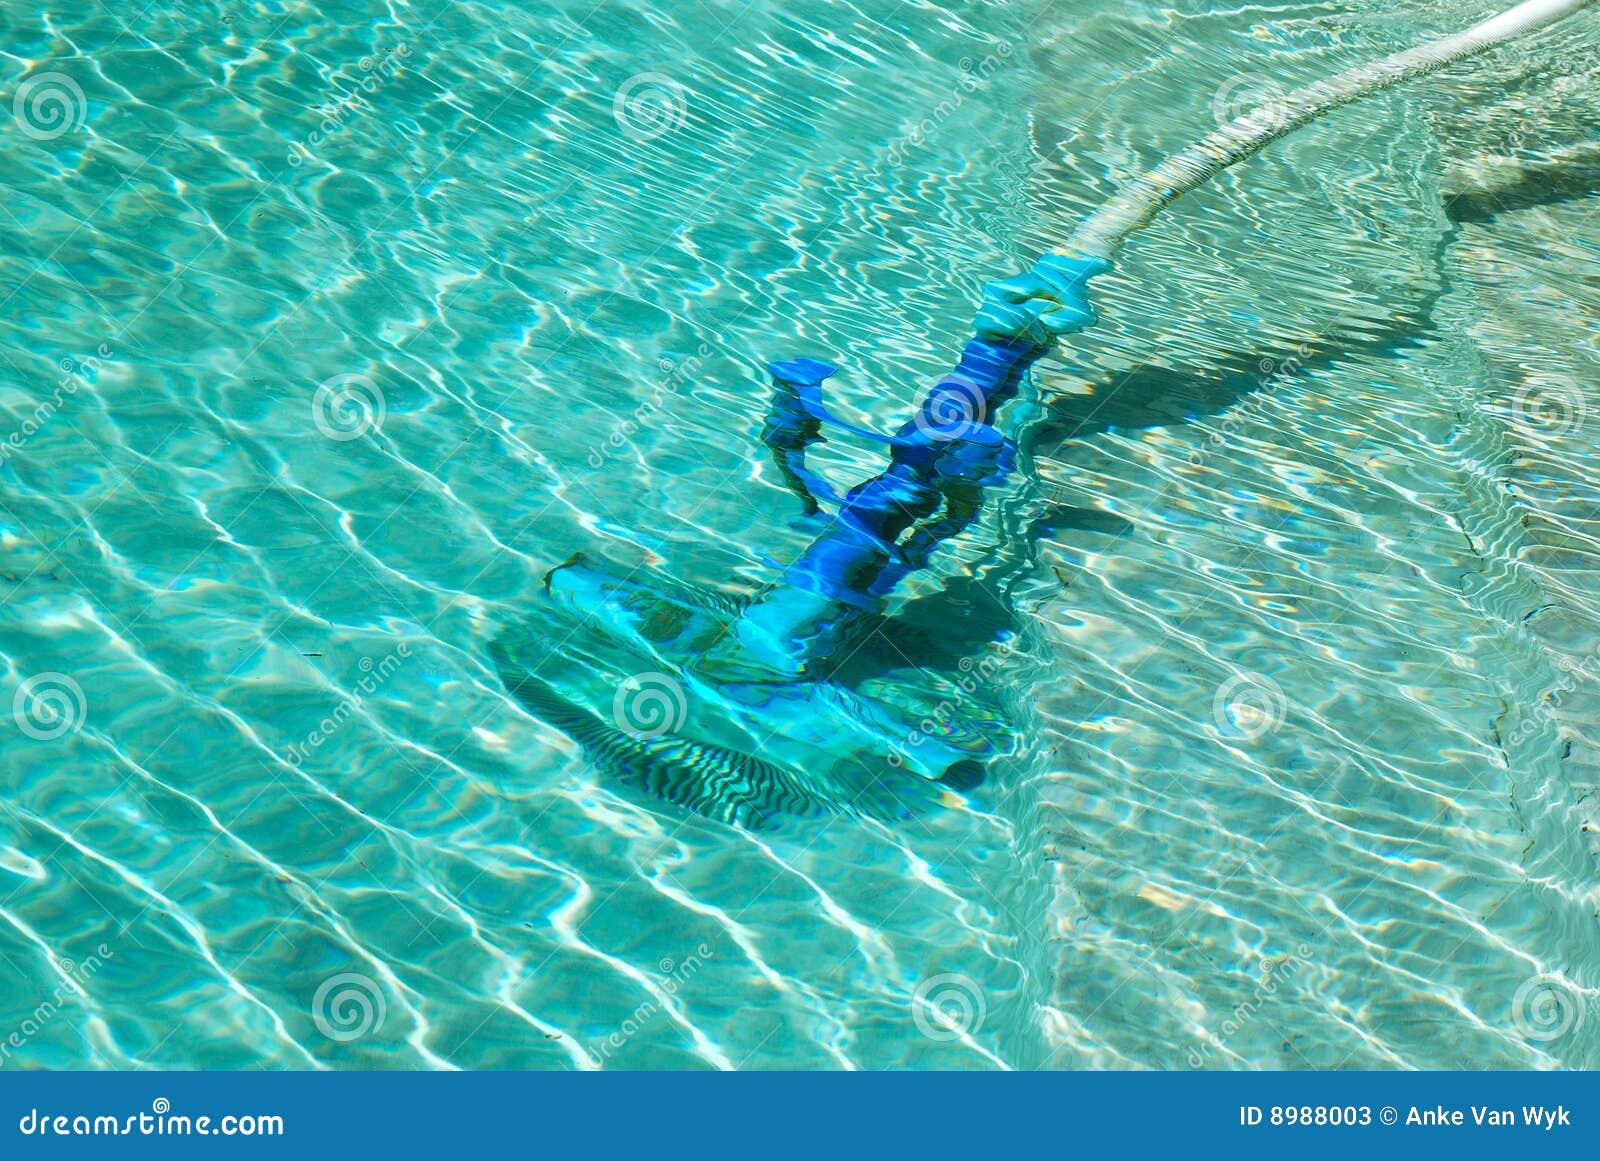 Piscina da limpeza fotos de stock imagem 8988003 - Business plan piscina ...